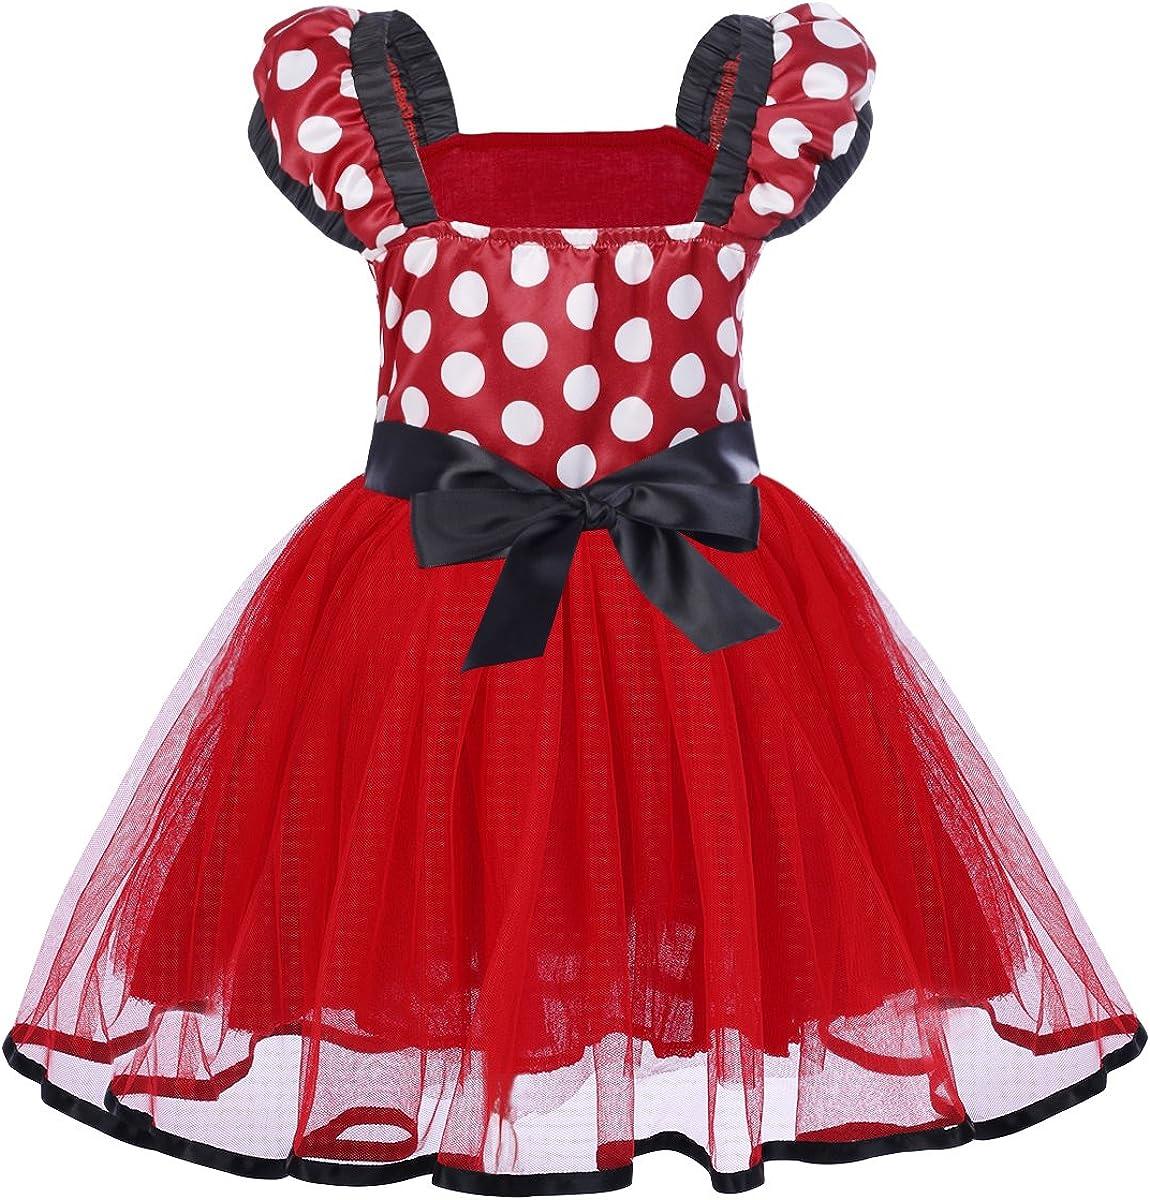 IBTOM CASTLE Girls Polka Dots Princess Party Cosplay Pageant Fancy Costume Tutu Birthday Dress up+Ears Headband